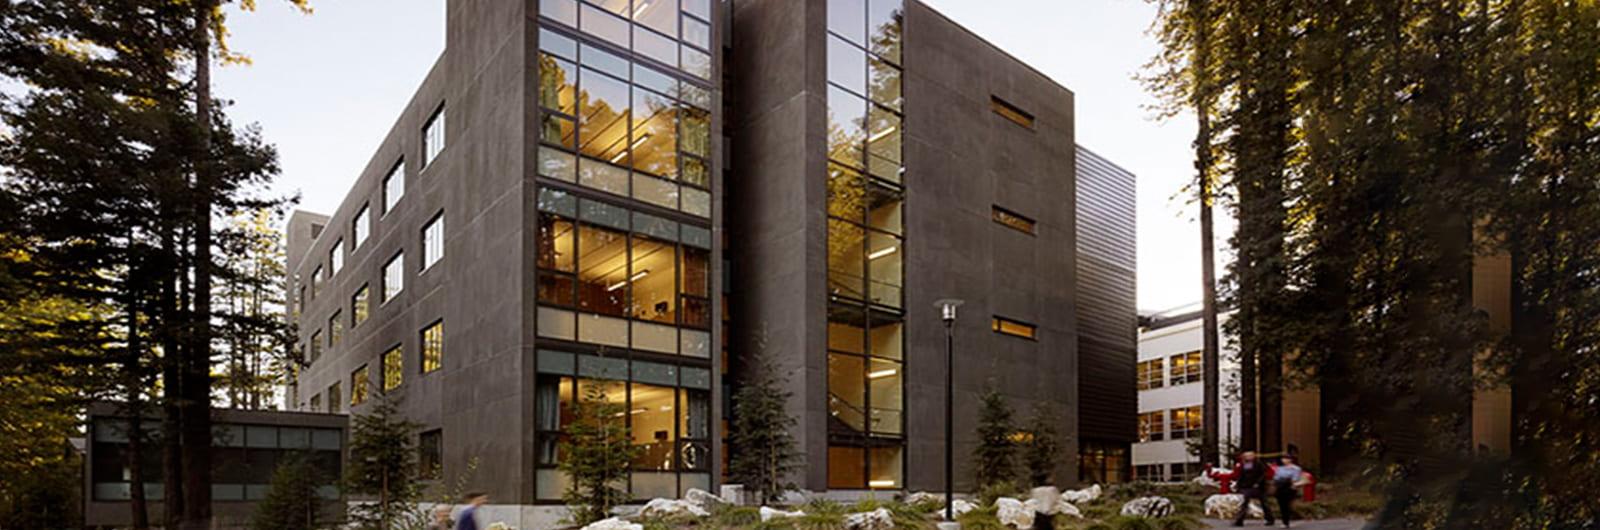 Biomedical Sciences Building (BioMed)